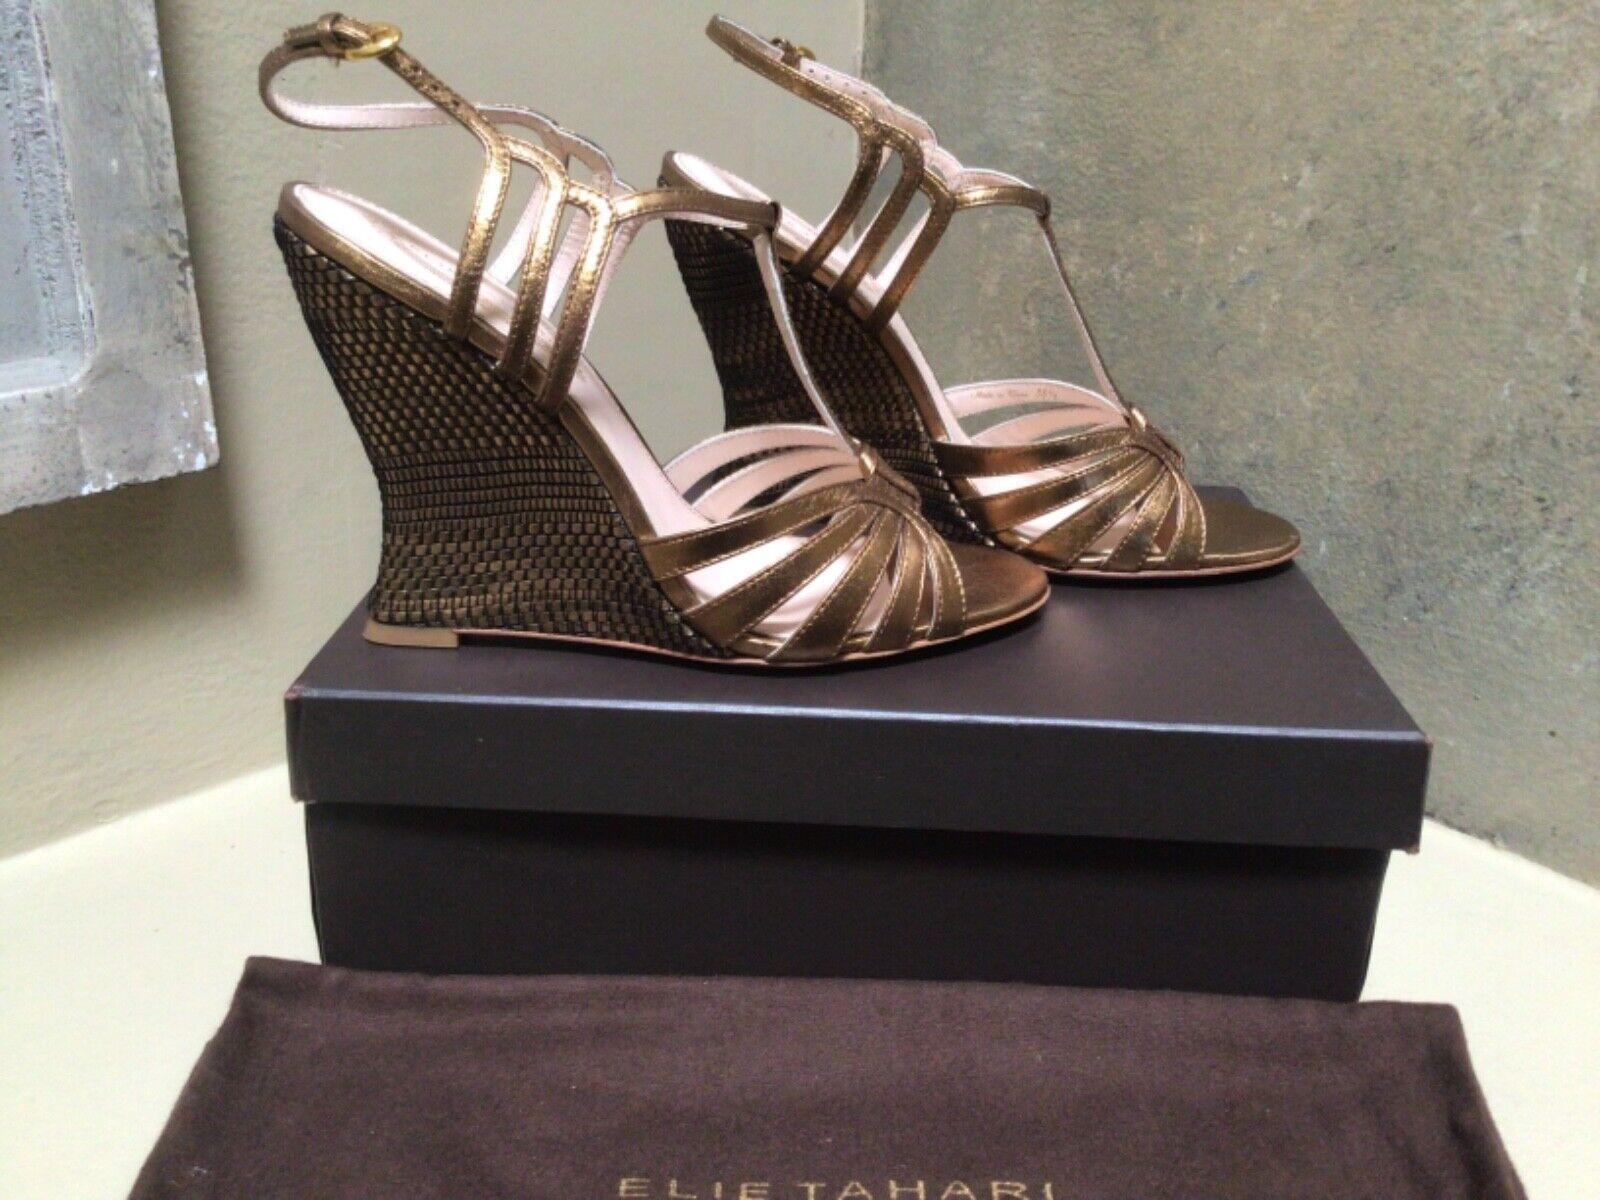 NIB ELIE TAHARI basket weave wedge sandals Metallic Leather bronze shoes 8 US